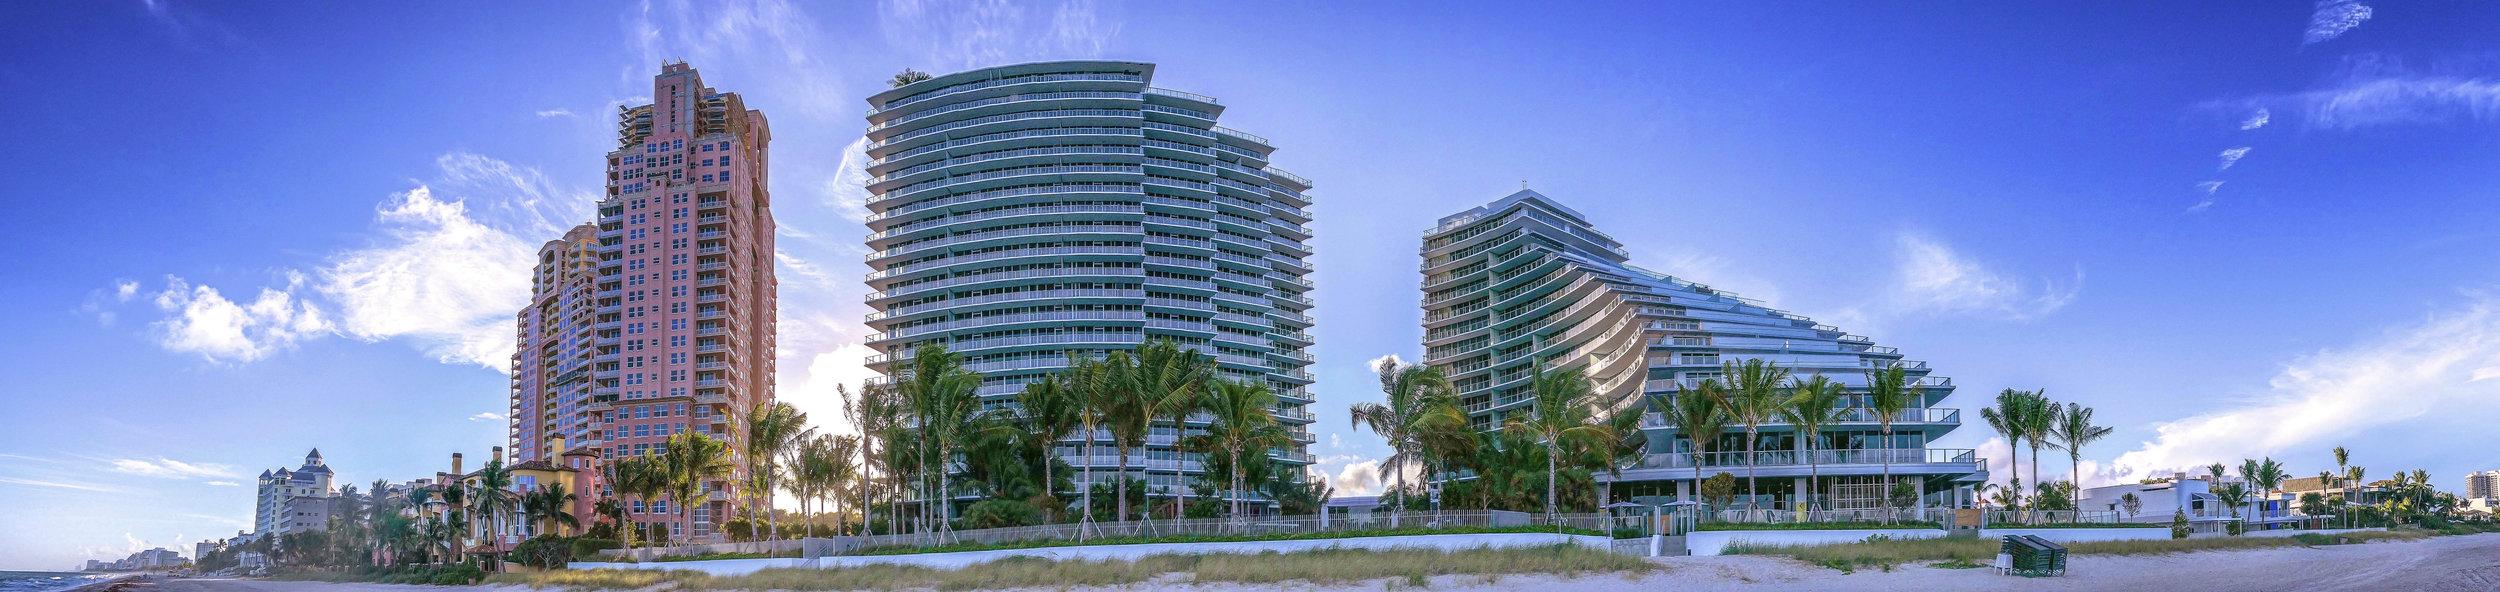 Auberge Beach Residence Ft Lauderdale Florida